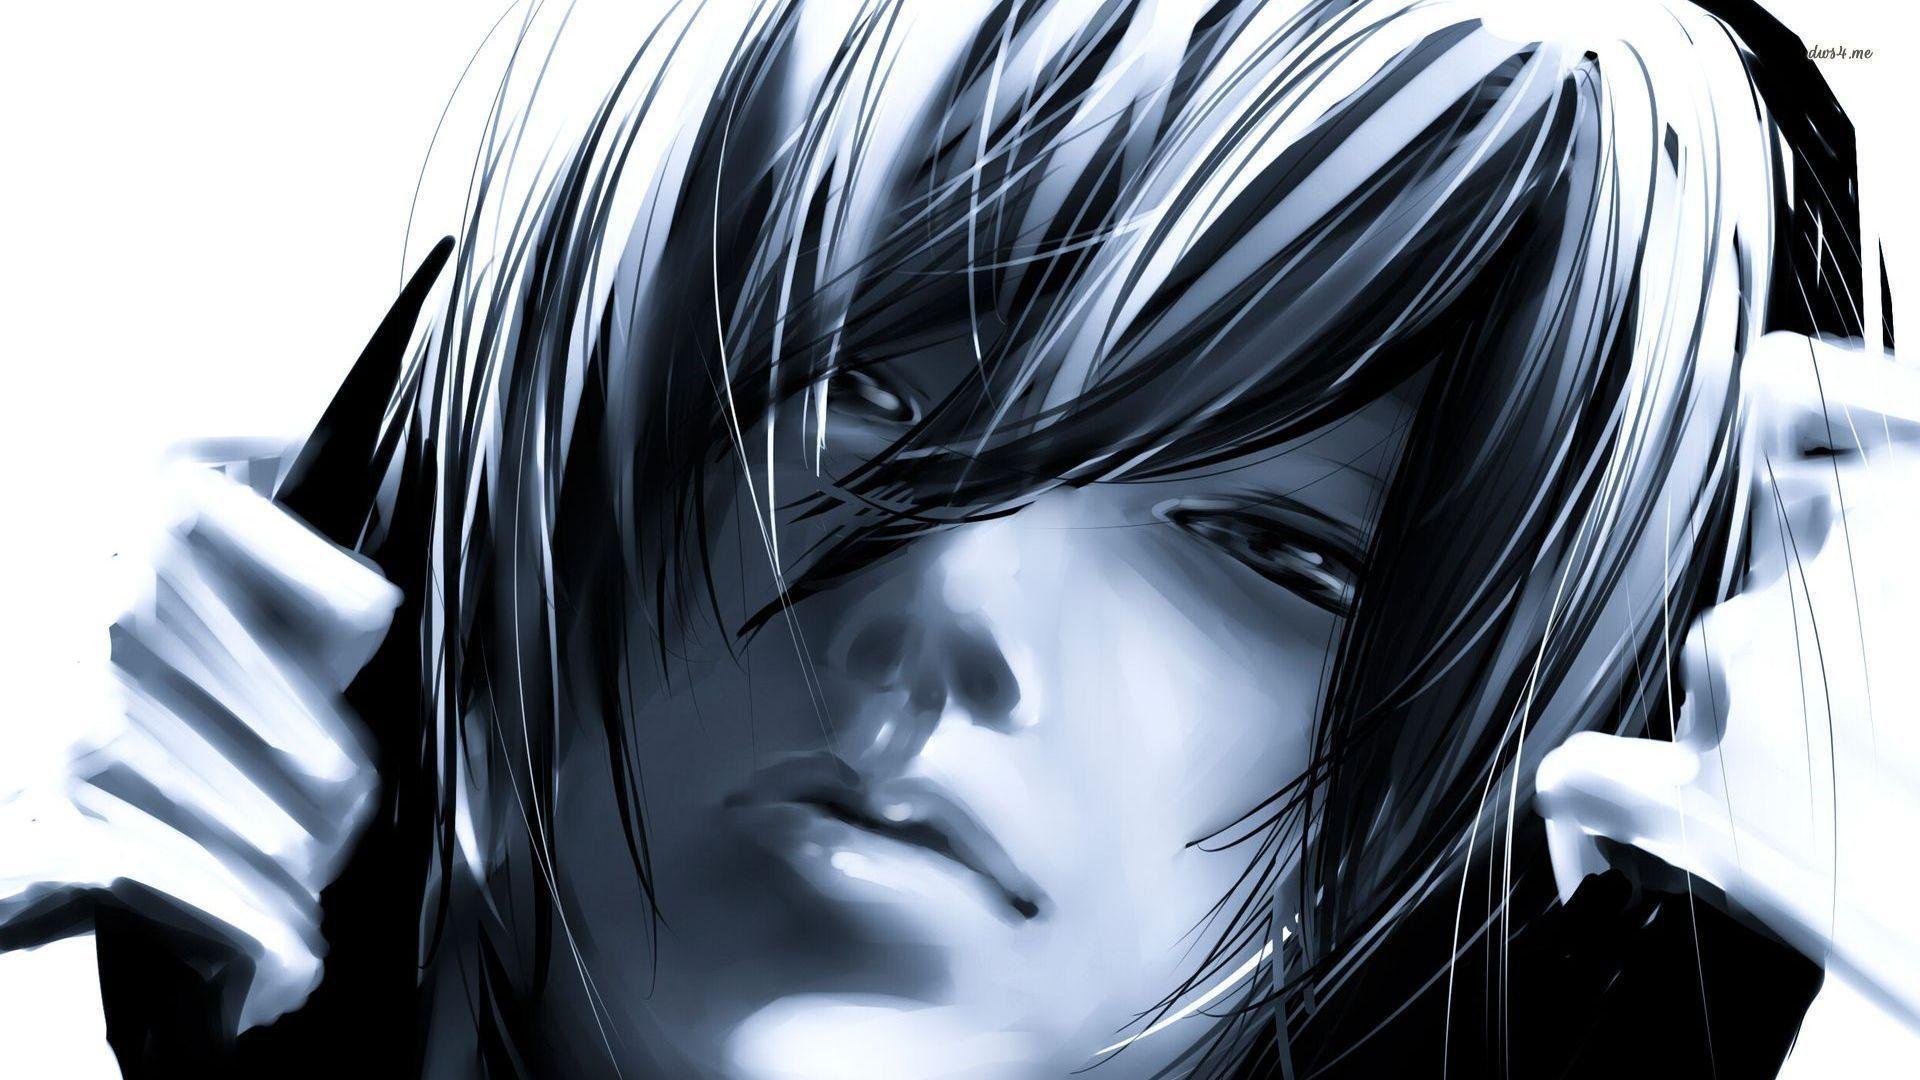 Oct 31, 2020 · original resolution: Cool Boy Anime Wallpapers - Wallpaper Cave